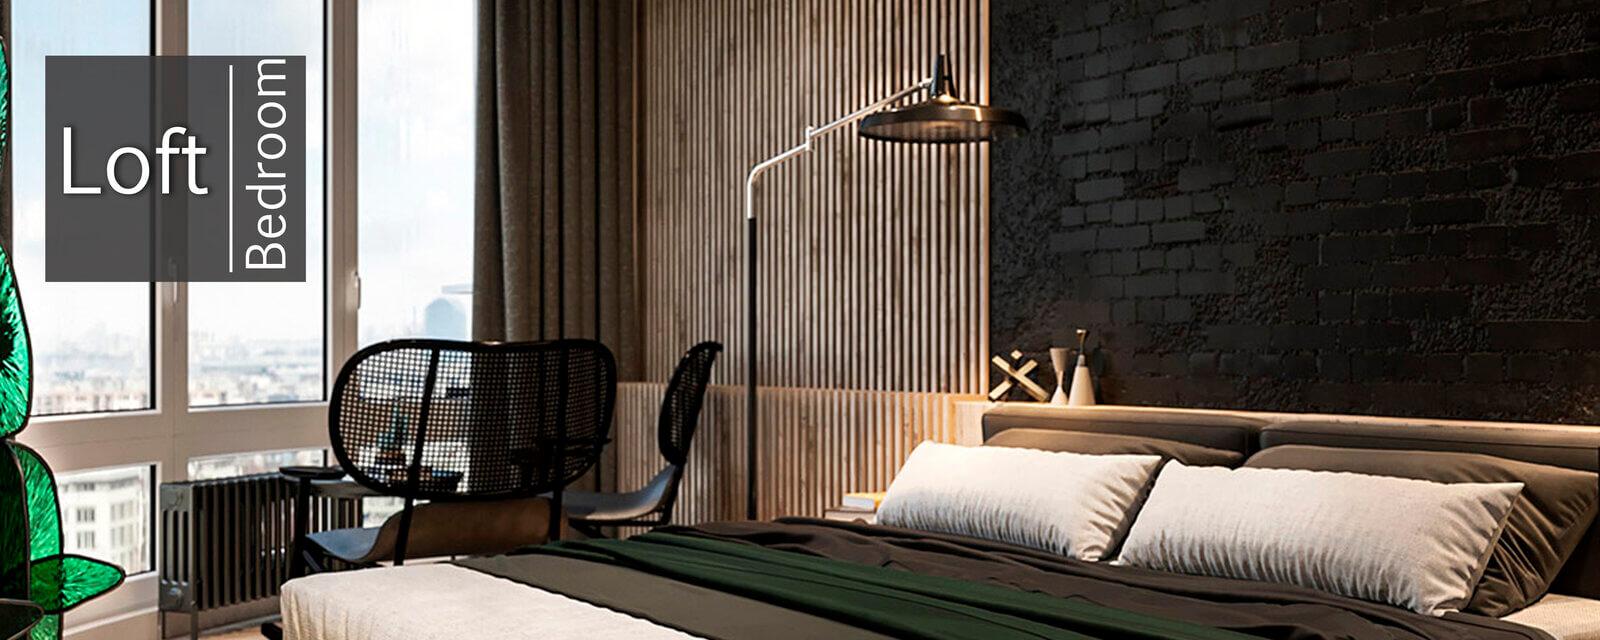 Loft | Bedroom